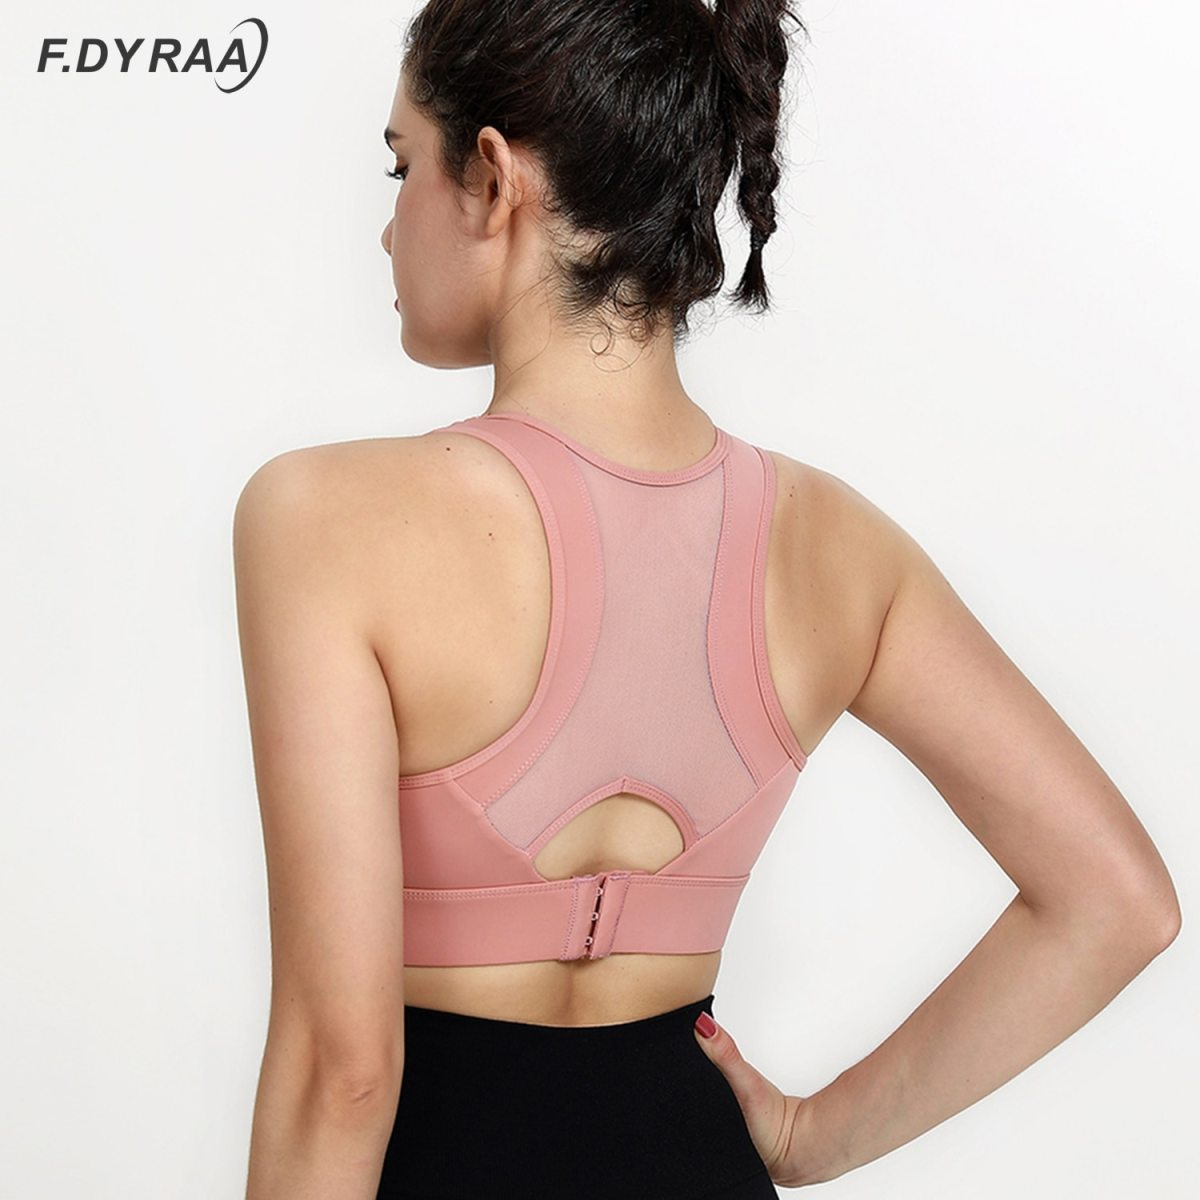 F DYRAA Sports Bra High Impact Support Woman Push up Sexy Beautiful Back Yoga Padded Crop